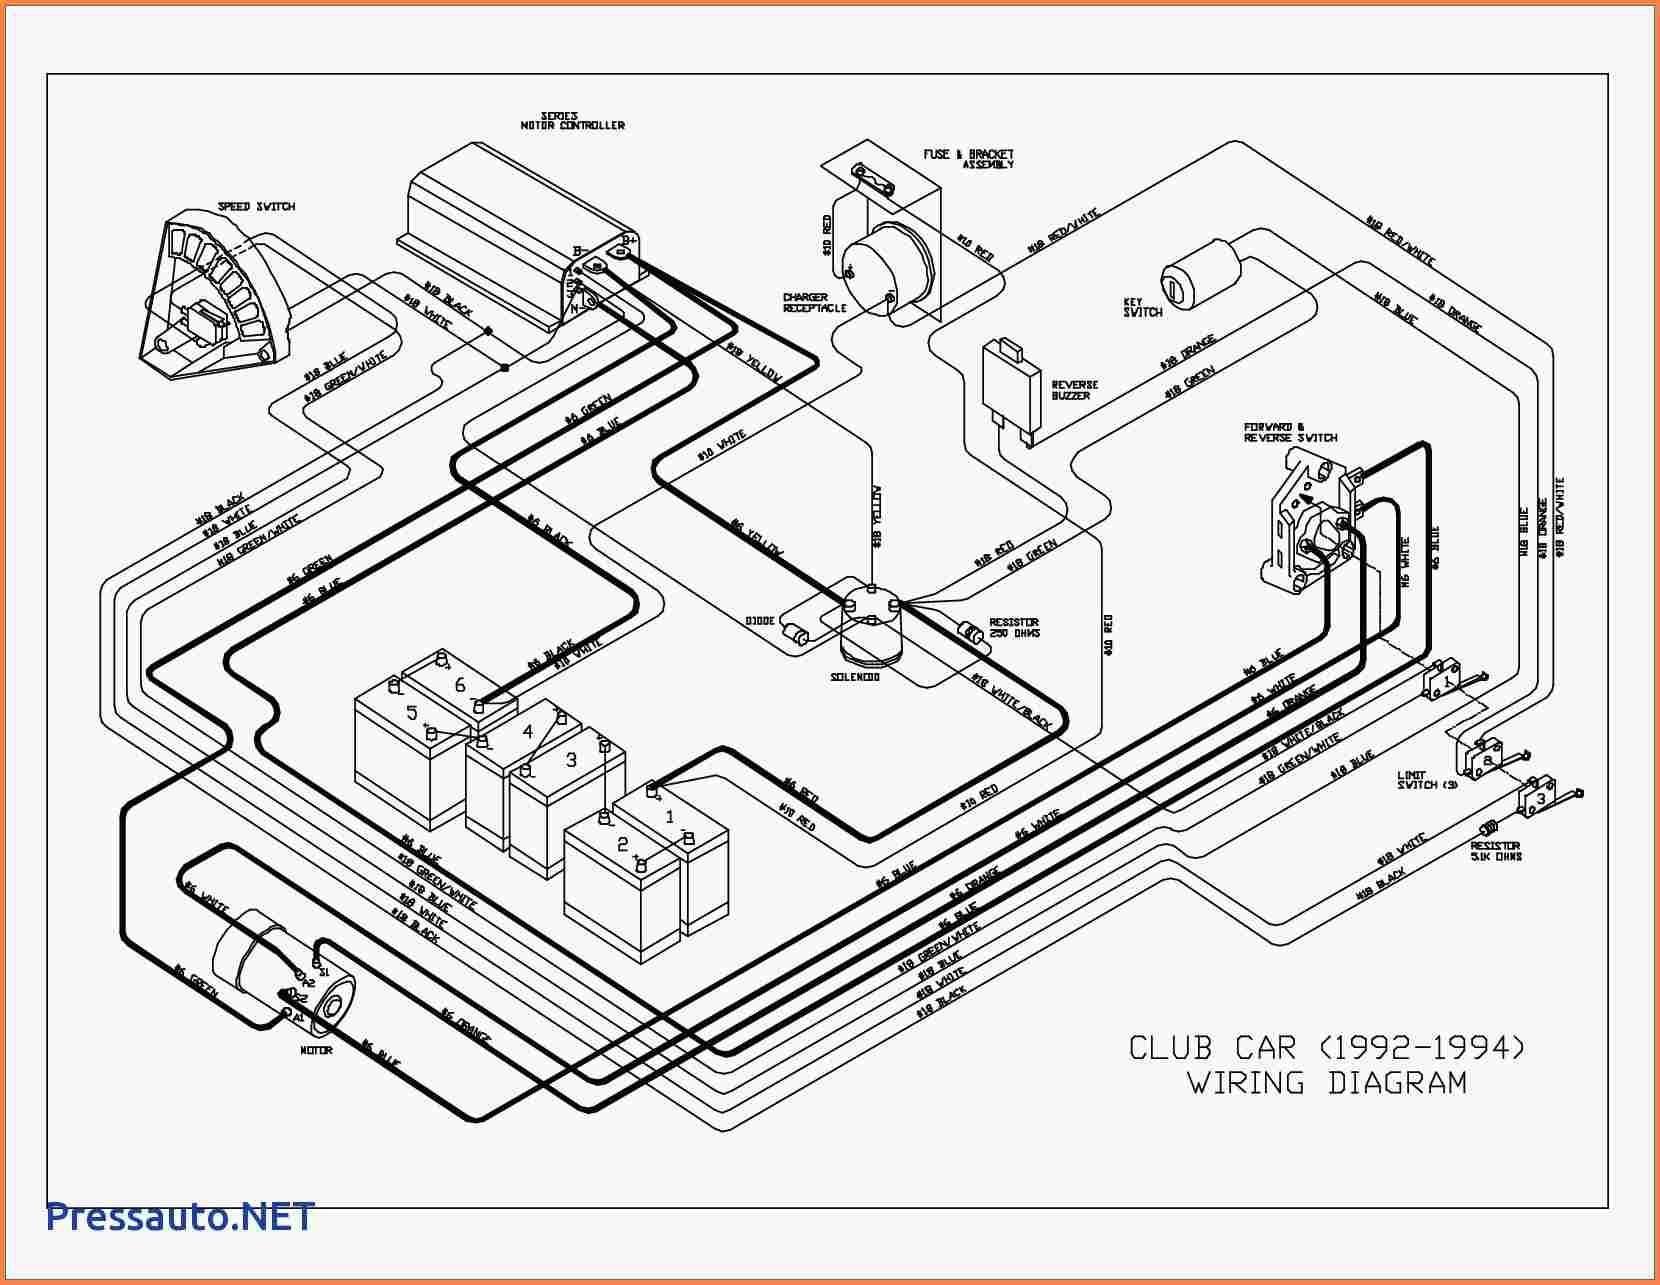 5BE508 1985 Club Car Forward Reverse Switch Wiring Diagram | Wiring  ResourcesWiring Resources